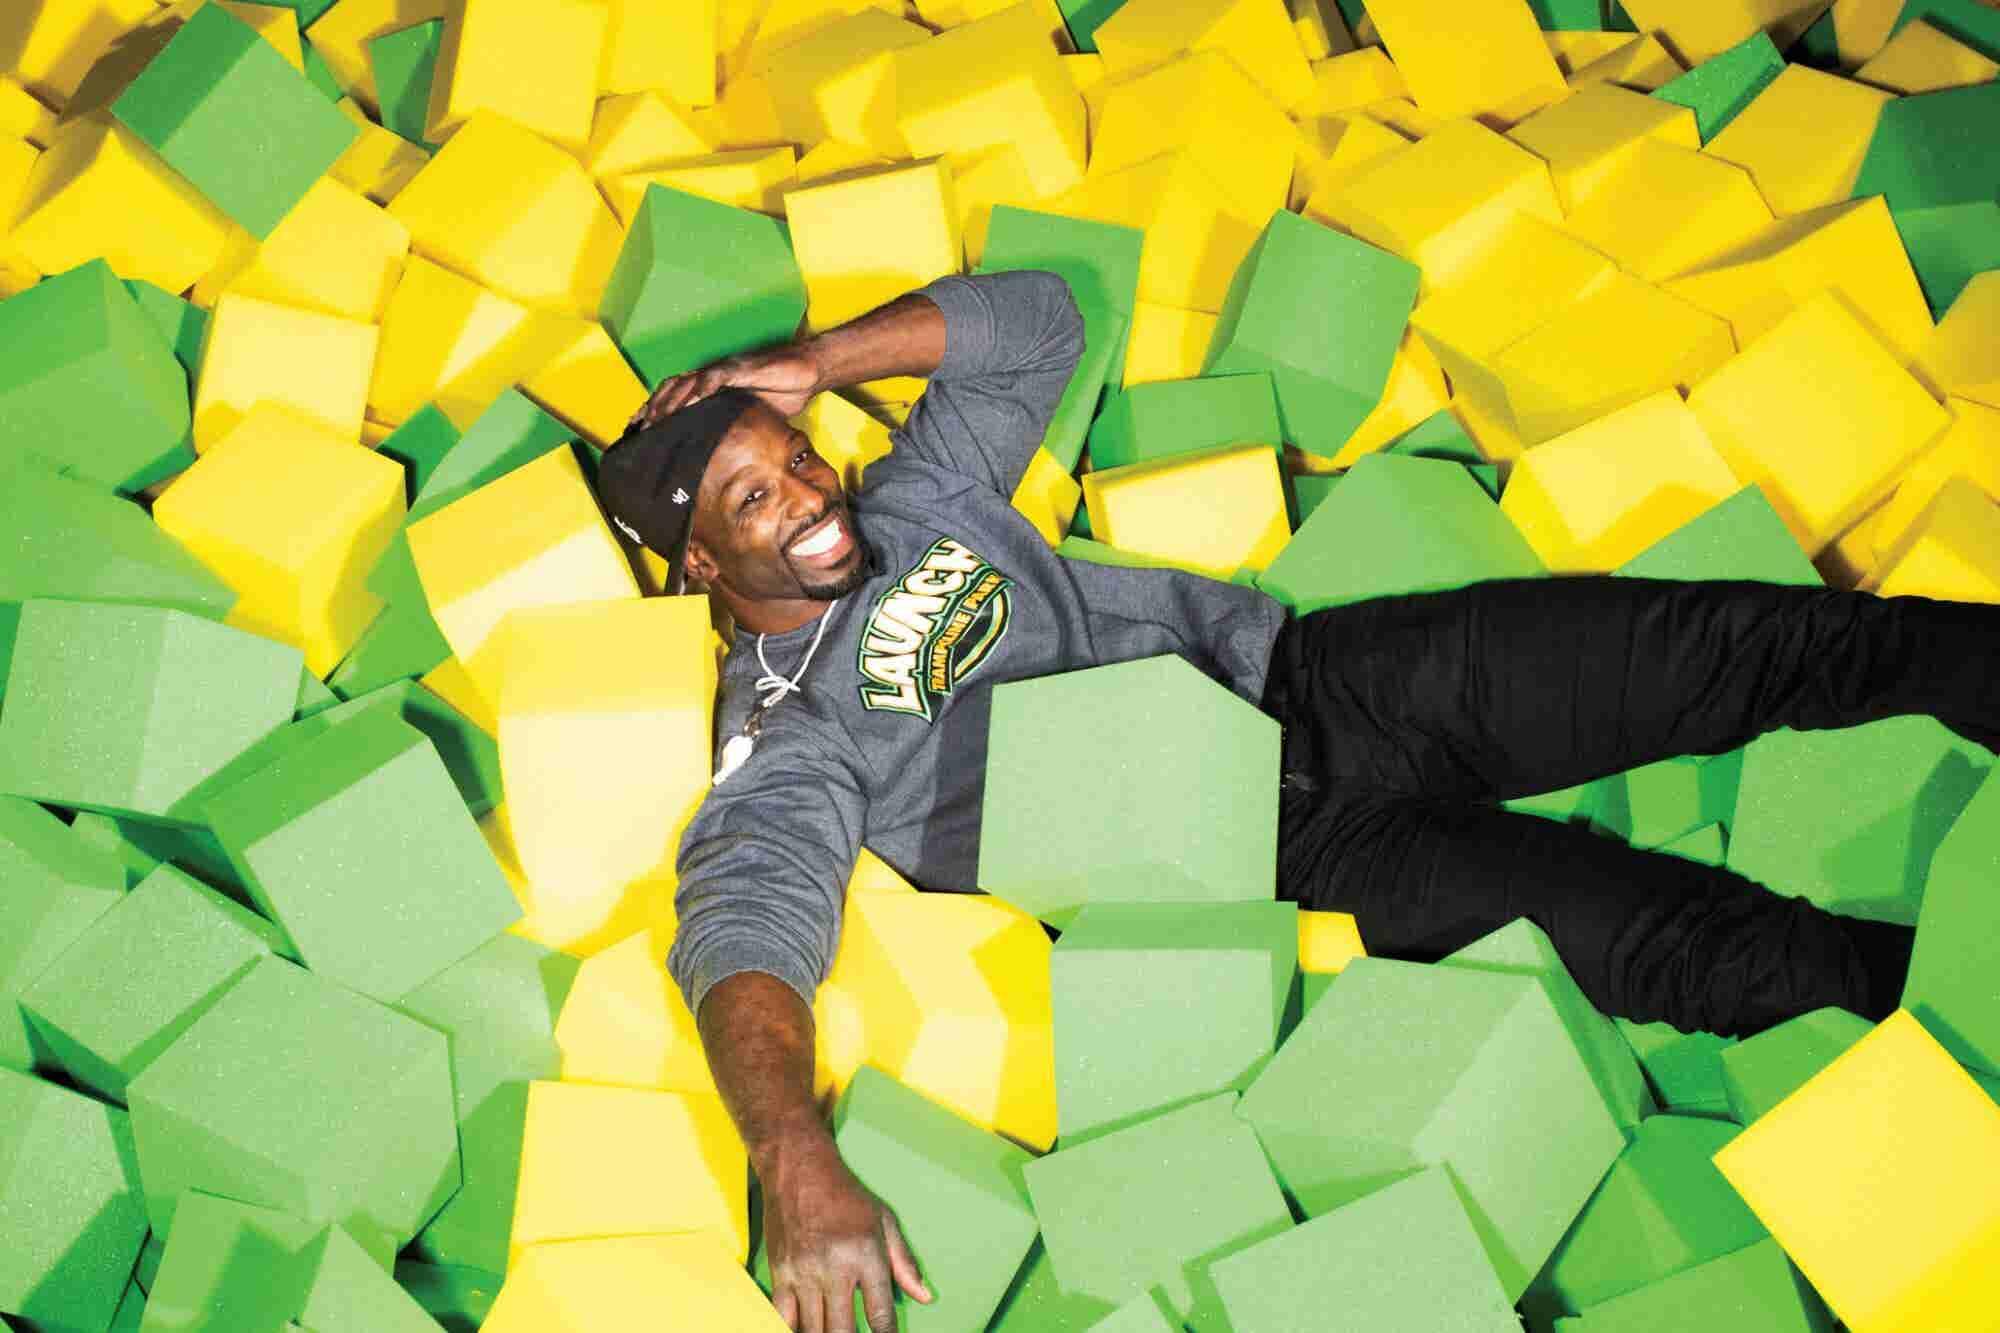 Former NFL Star Jason Avant Has a New Career -- In Trampoline Parks